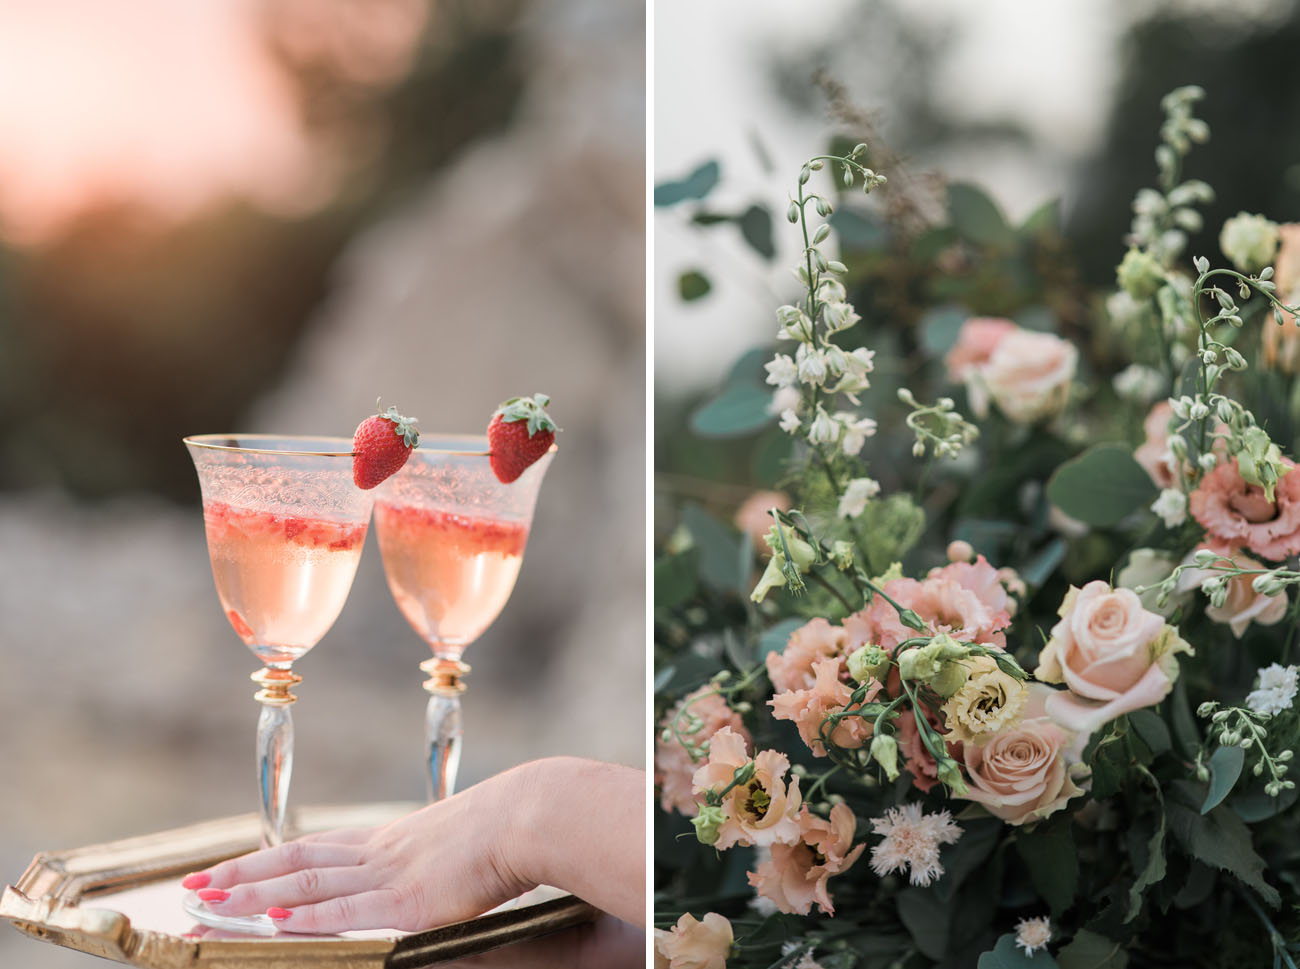 strawberry drinks